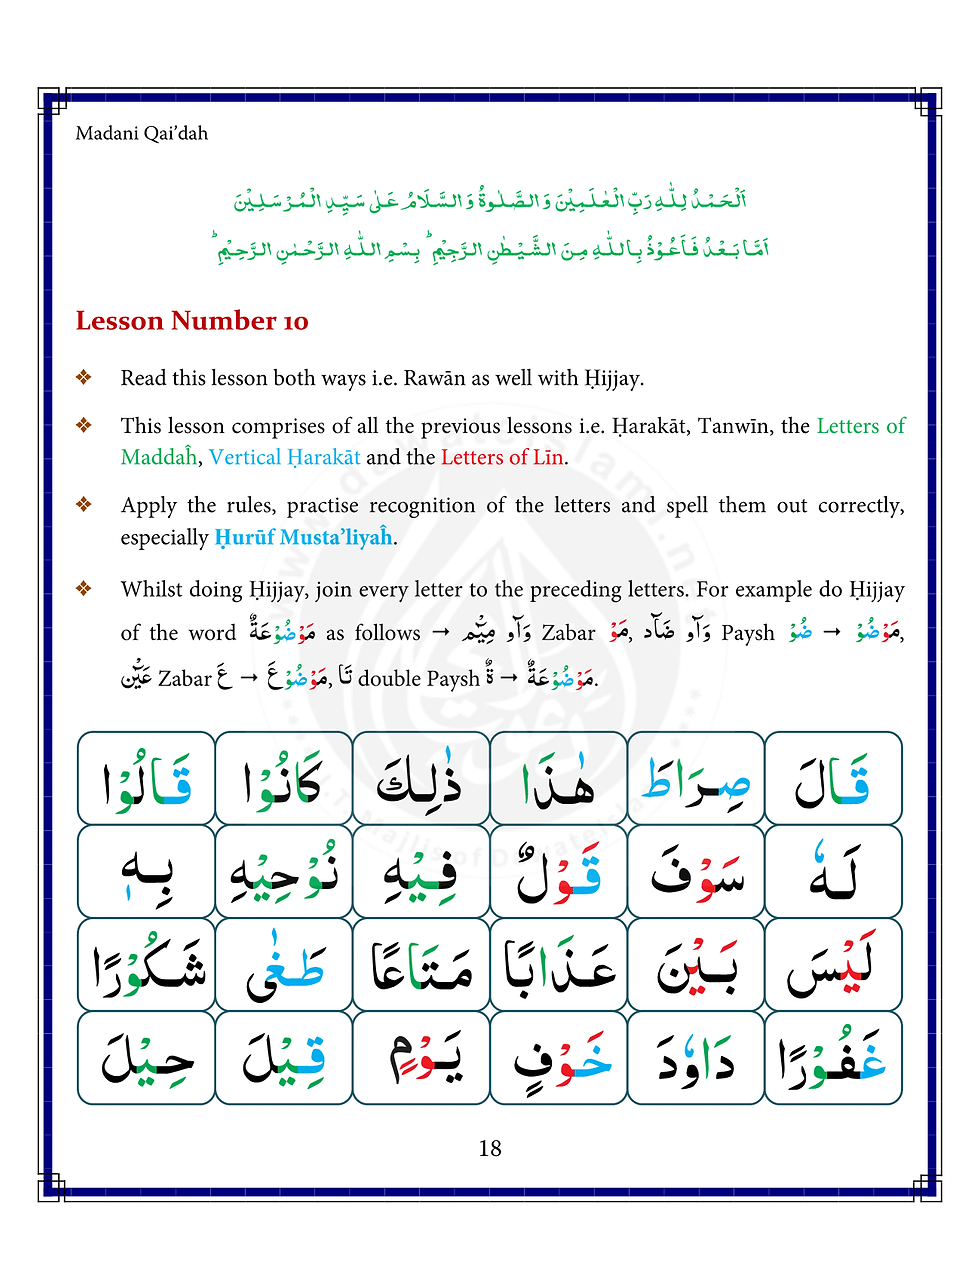 Madani Qaidah-28.png